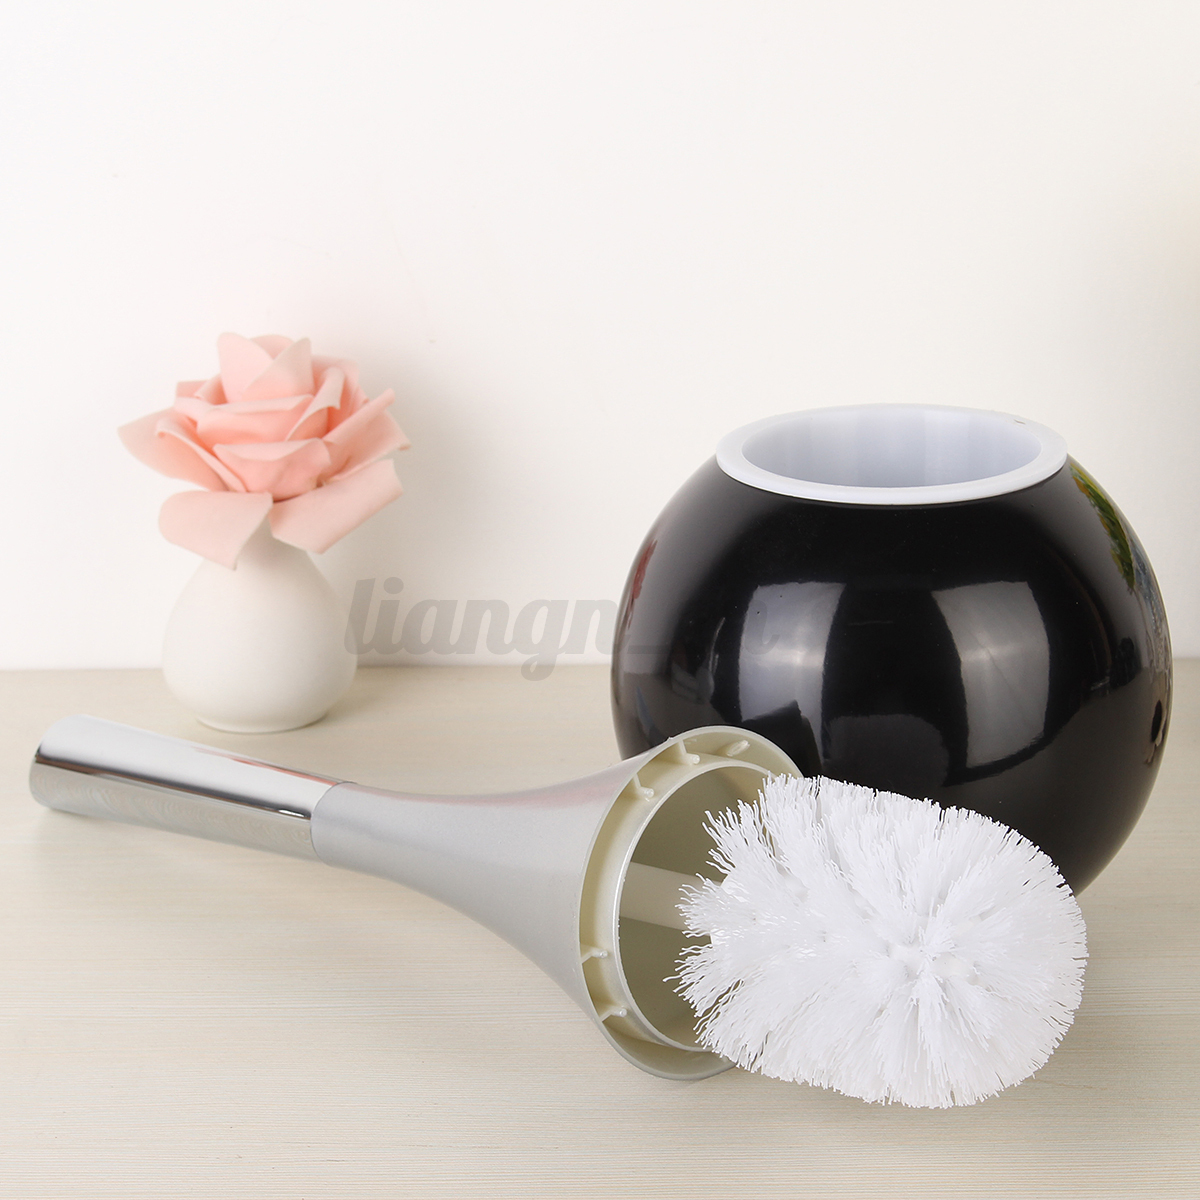 brosse de toilette bidet wc salle de bain nettoyage poign e m nage porte brosse ebay. Black Bedroom Furniture Sets. Home Design Ideas